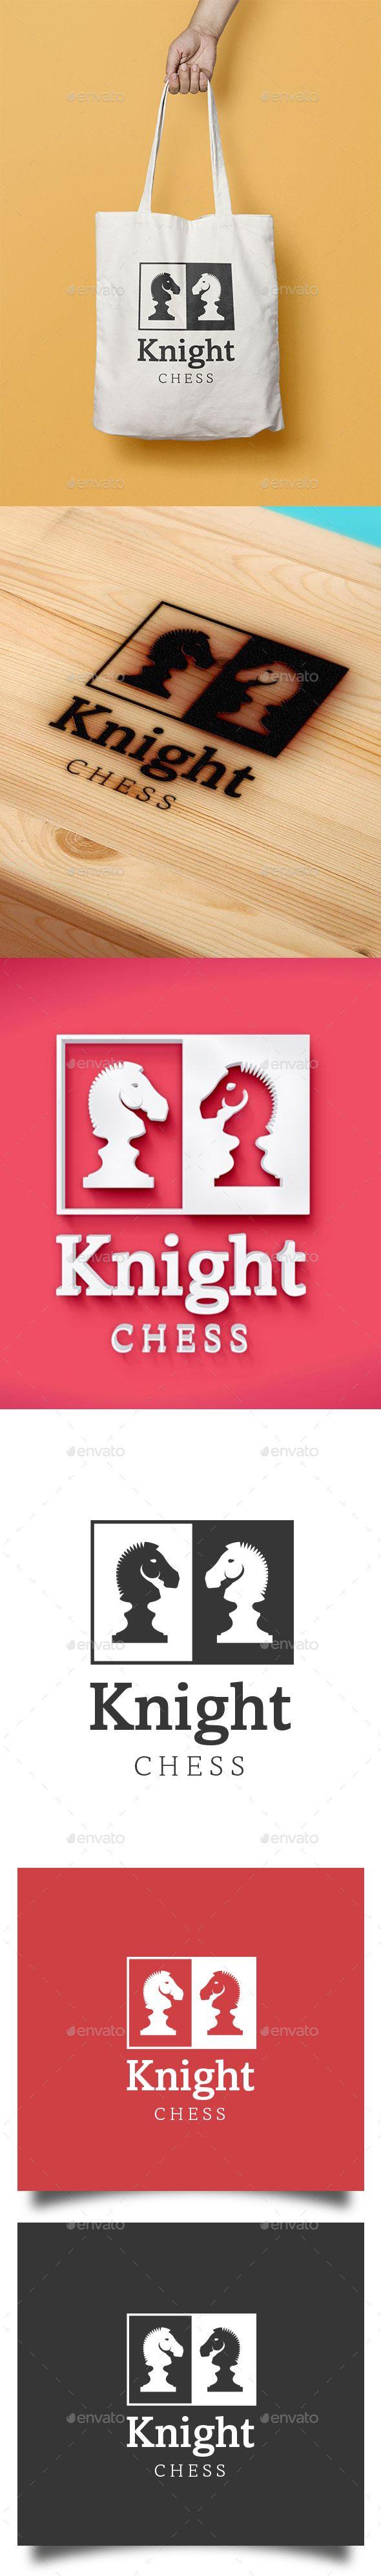 Knight Chess Logo